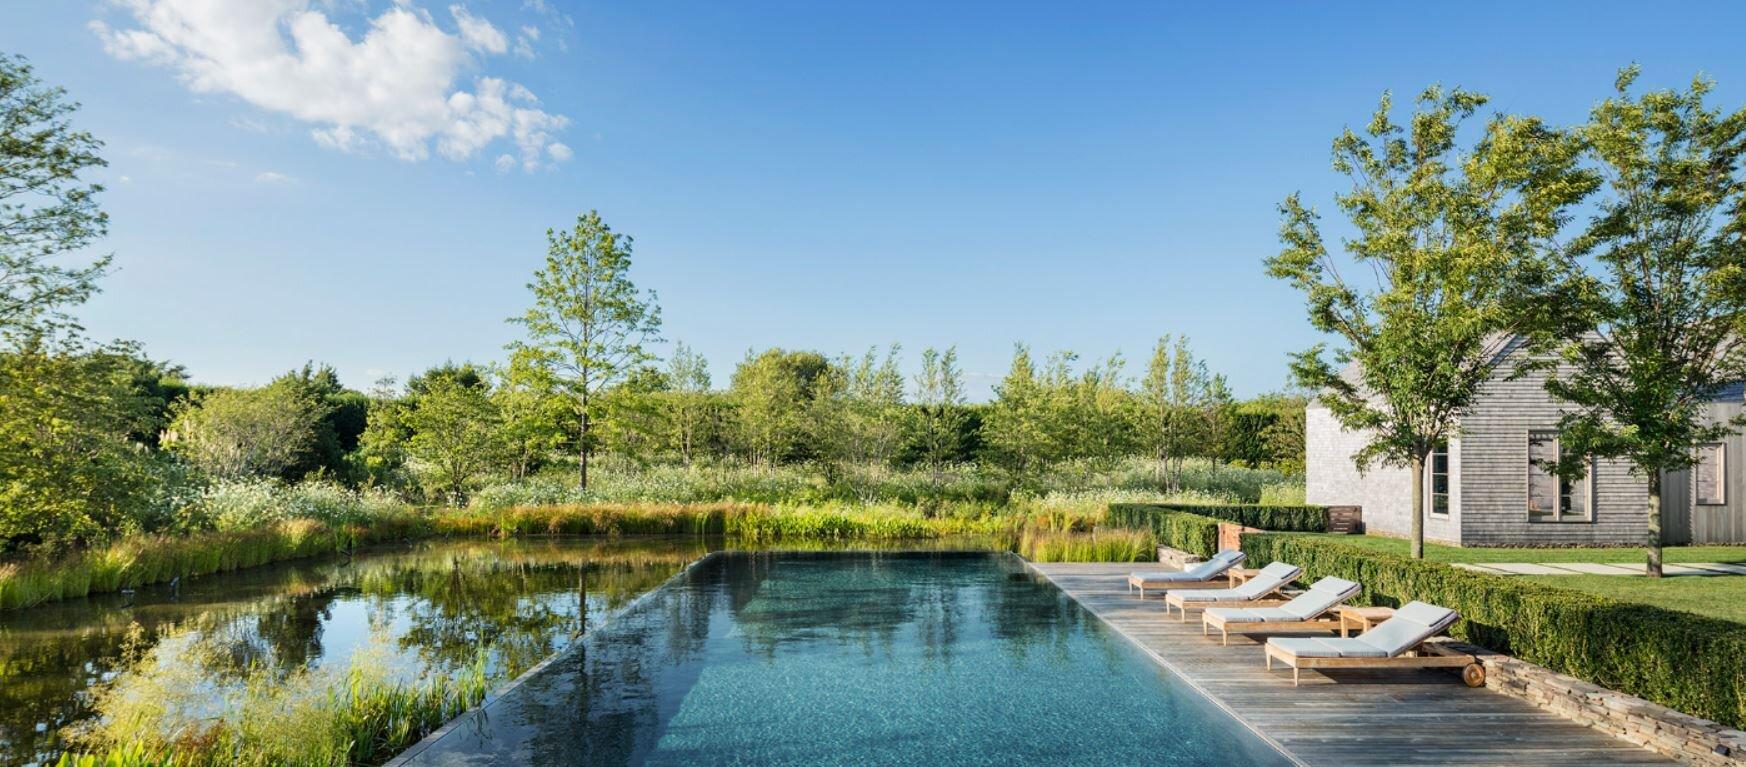 Steve Harris Landscape Garden Design